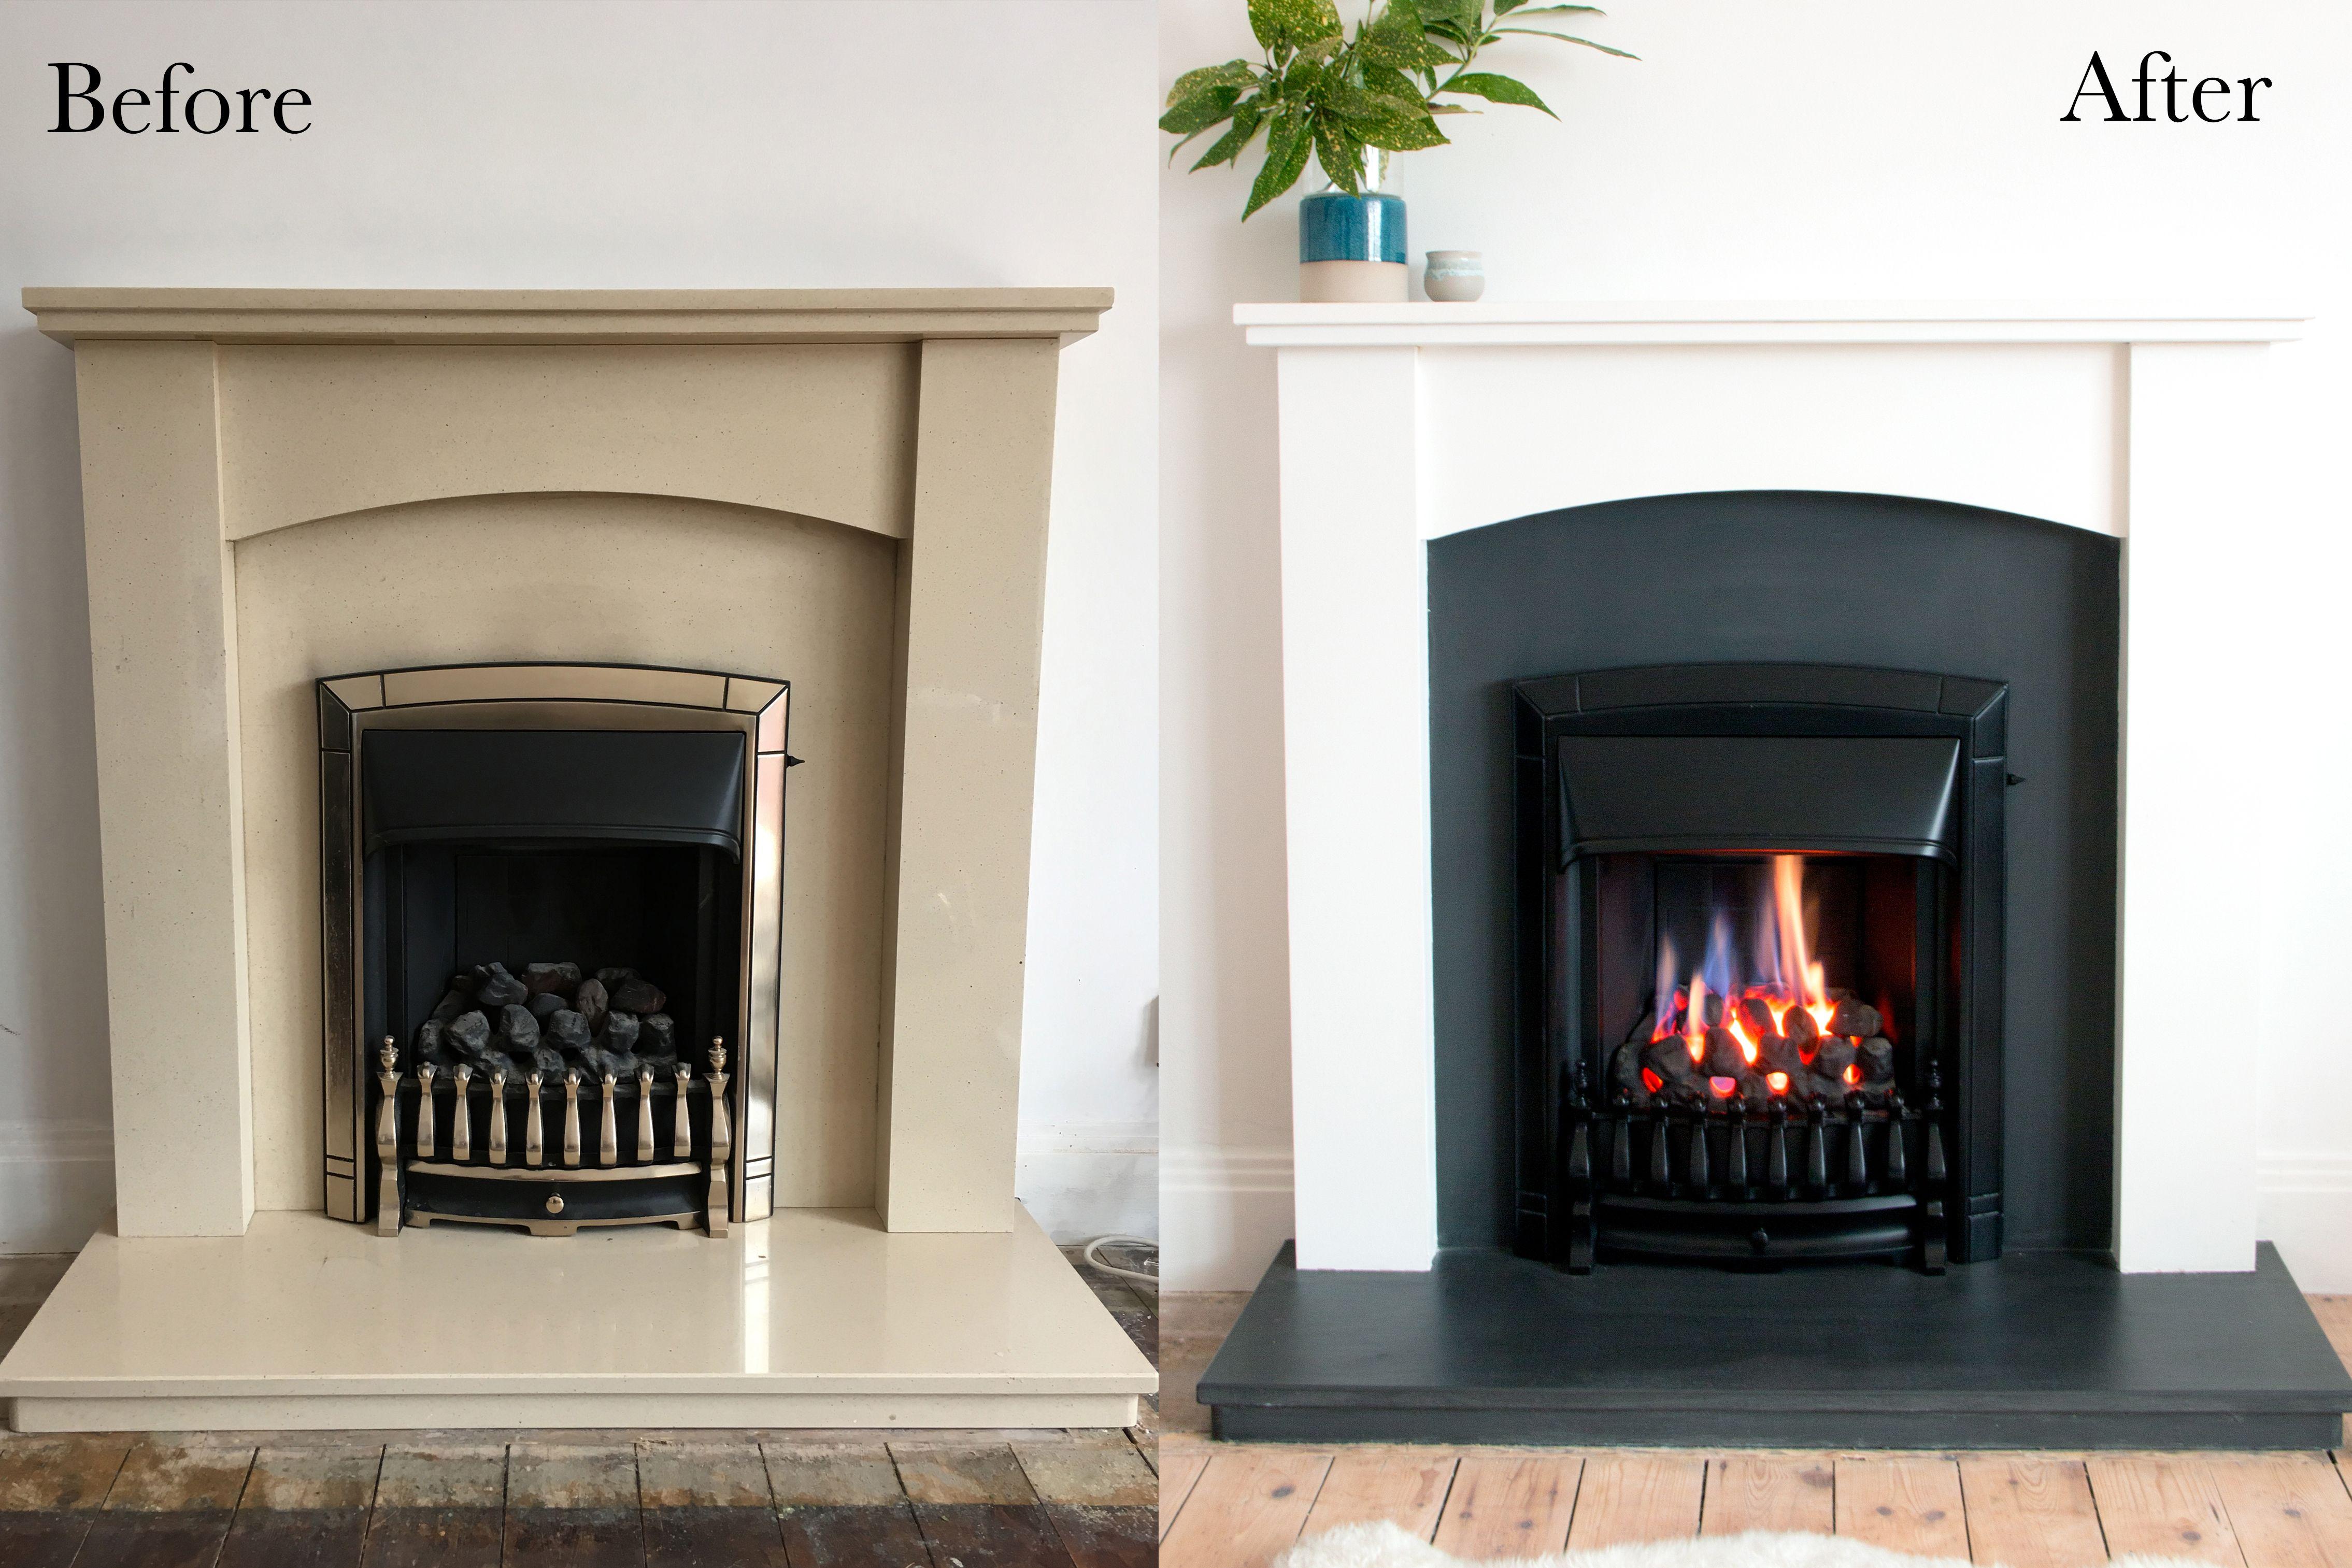 Houseofdibs Co Uk Fireplace Upgrade Diy Under 50 Fireplace